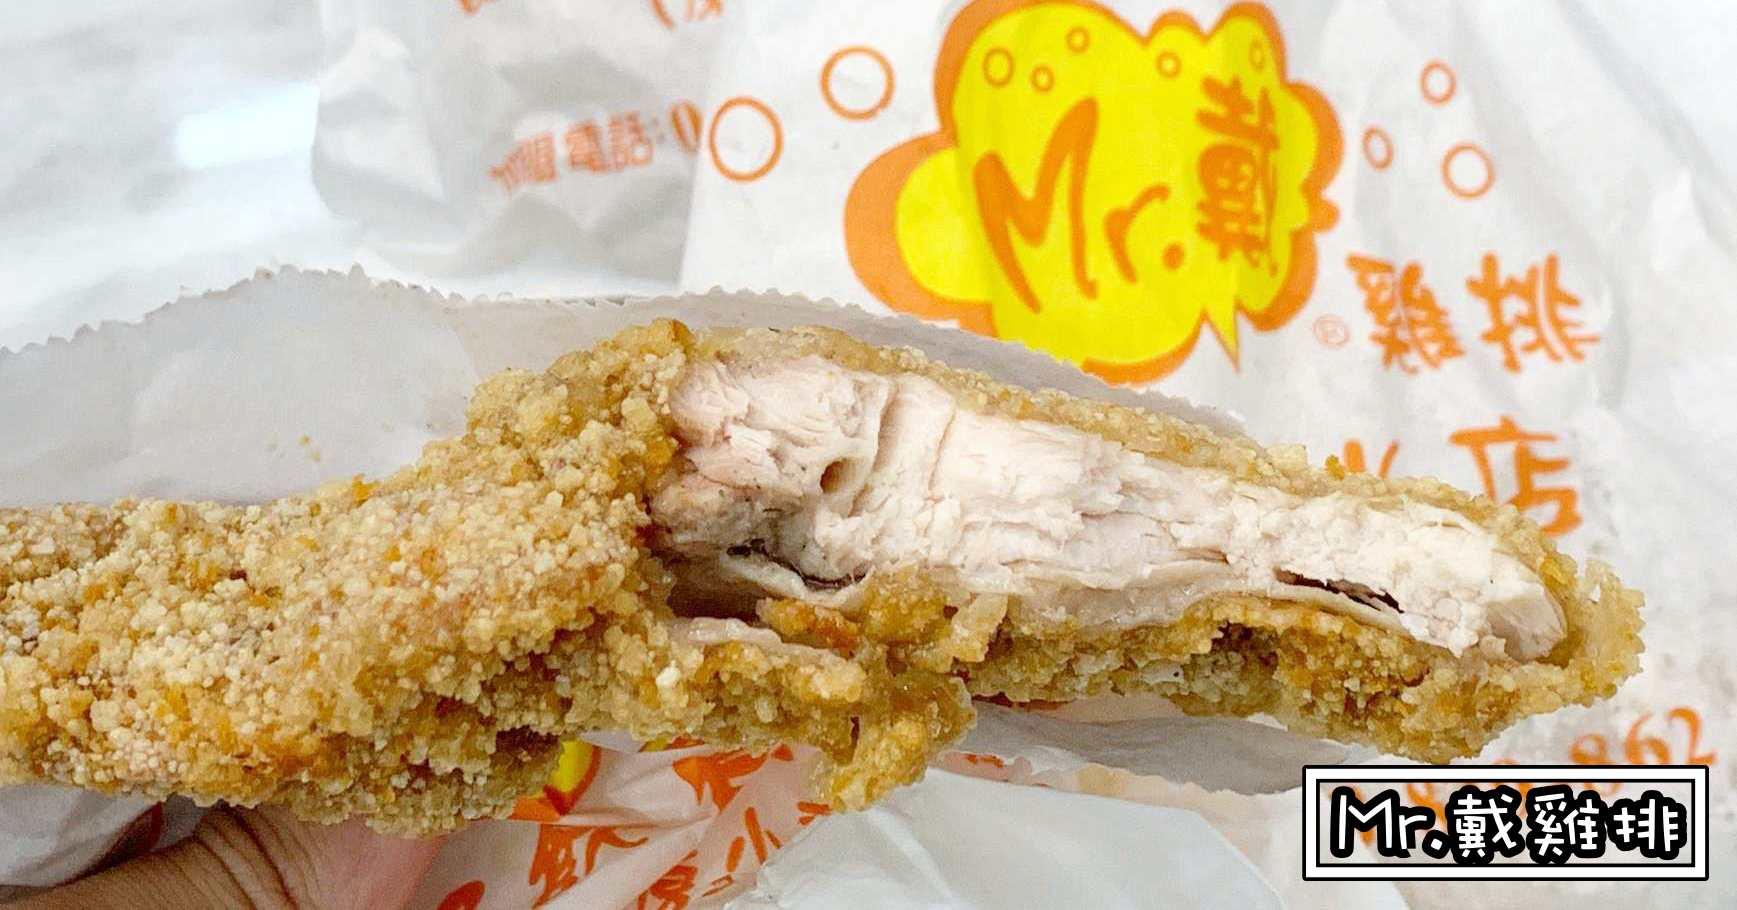 Mr.戴雞排,小戴雞排,Mr.戴雞排菜單,Mr.戴雞排價錢,上新莊美食,上新莊雞排 @Nash,神之領域